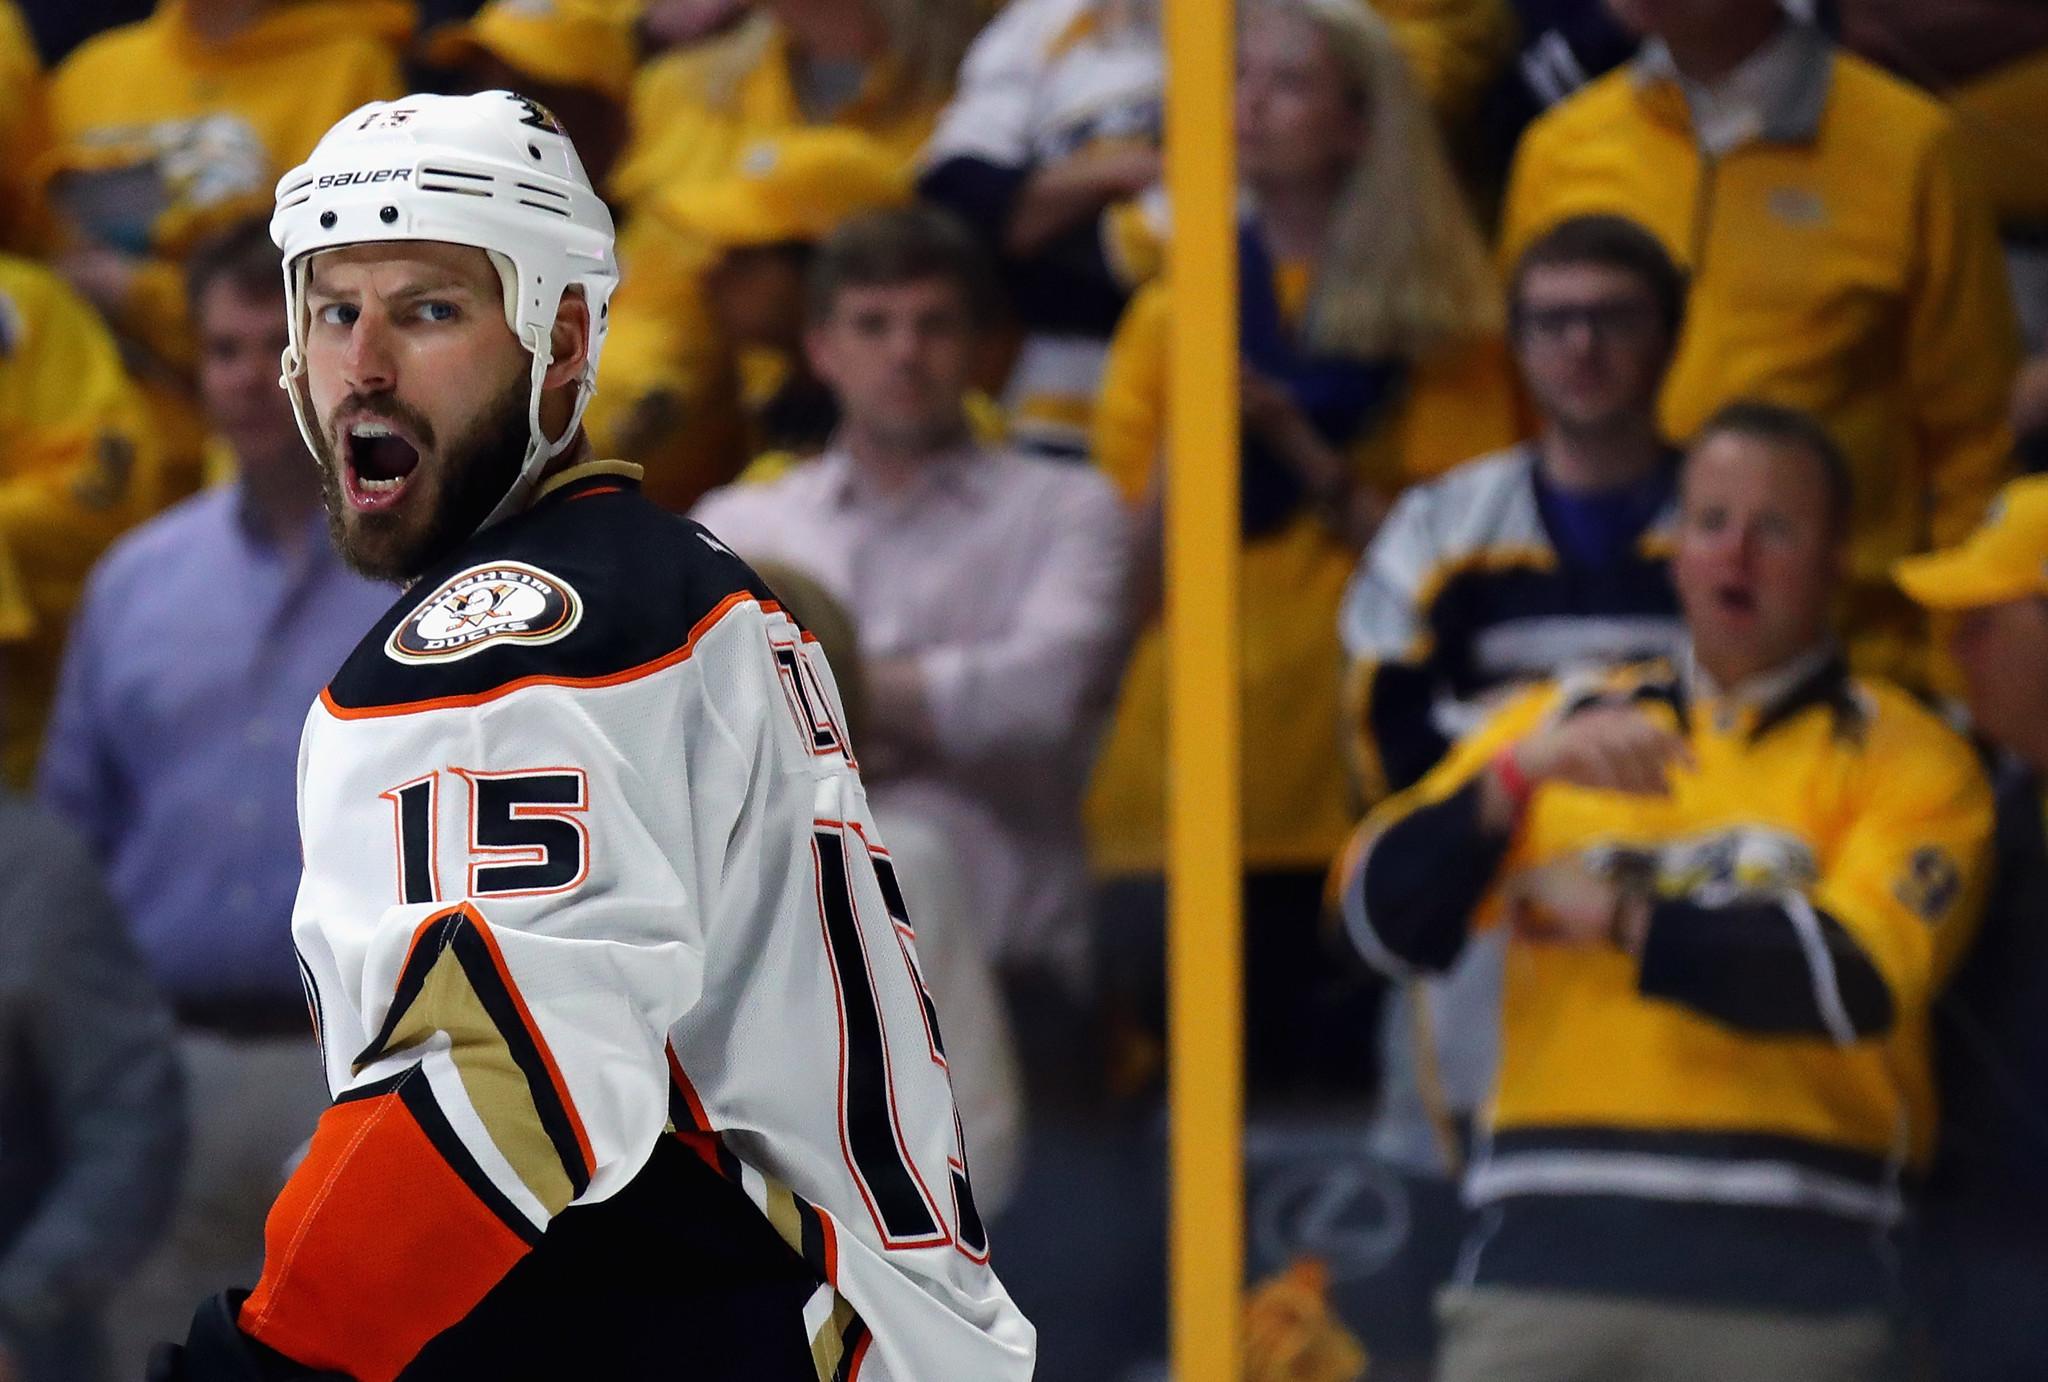 Ducks Captain Ryan Getzlaf Fined For Apparent Homophobic